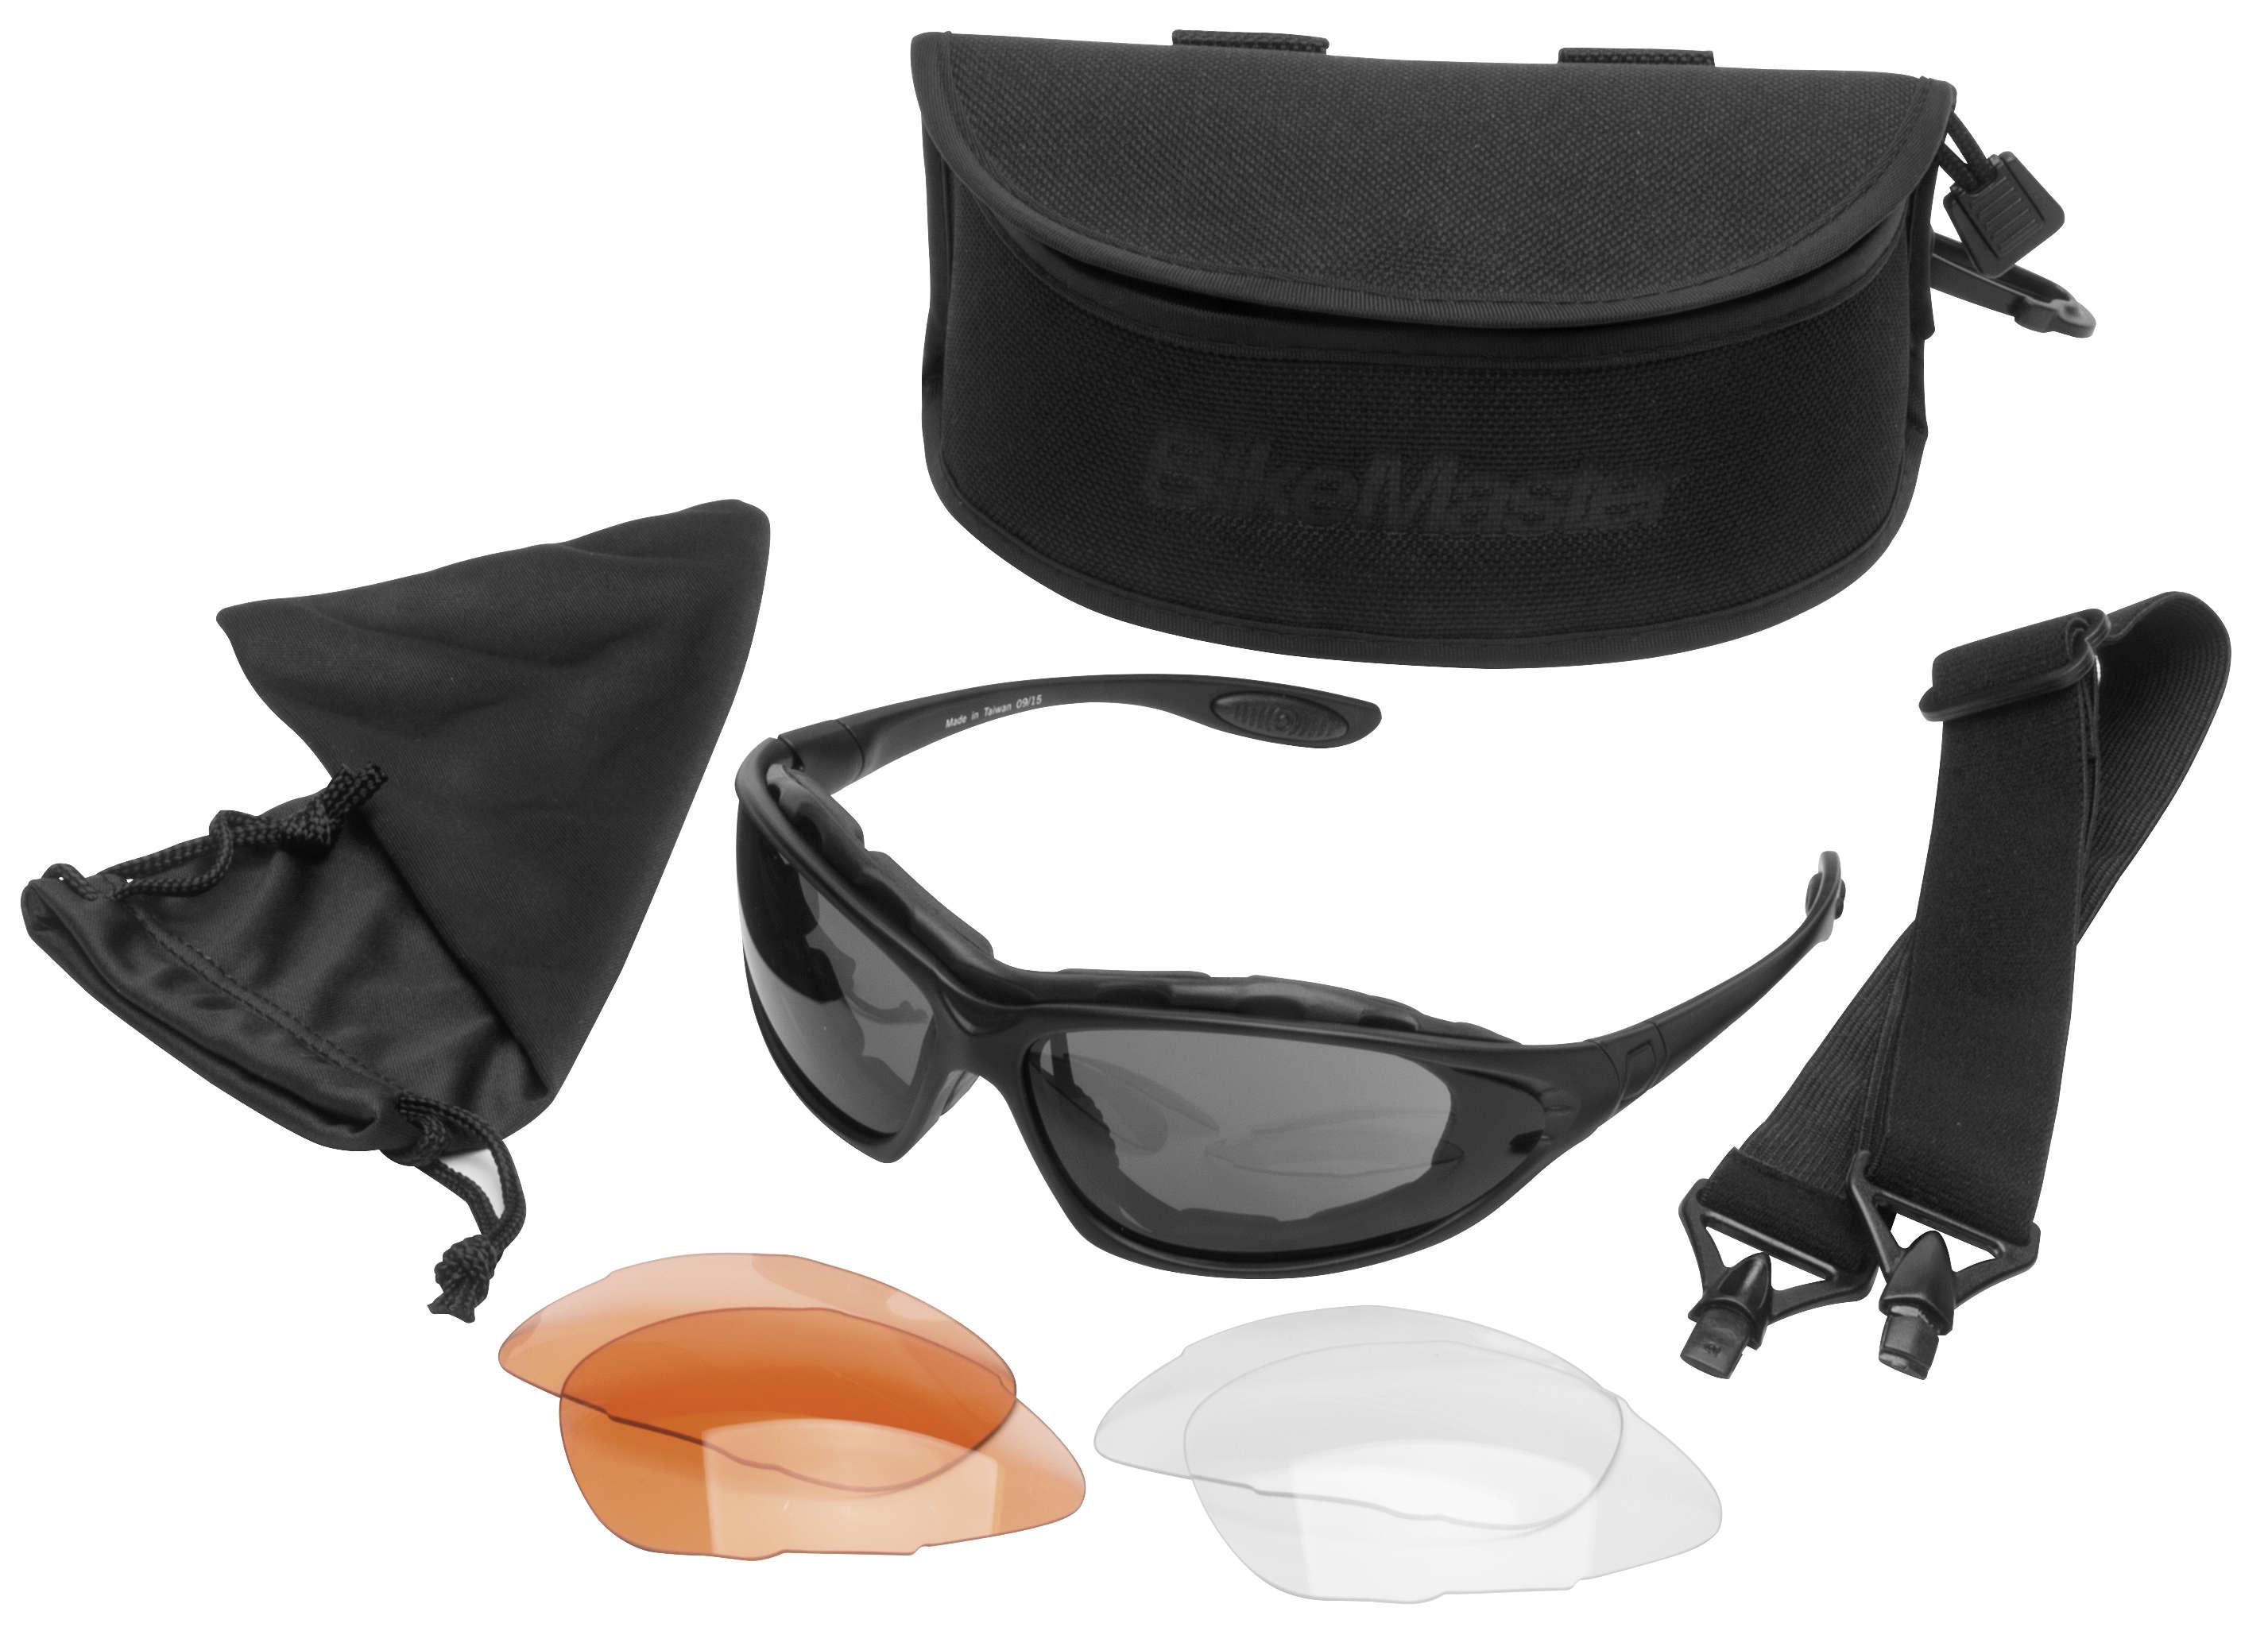 Windshield Convertible Sunglasses Kit